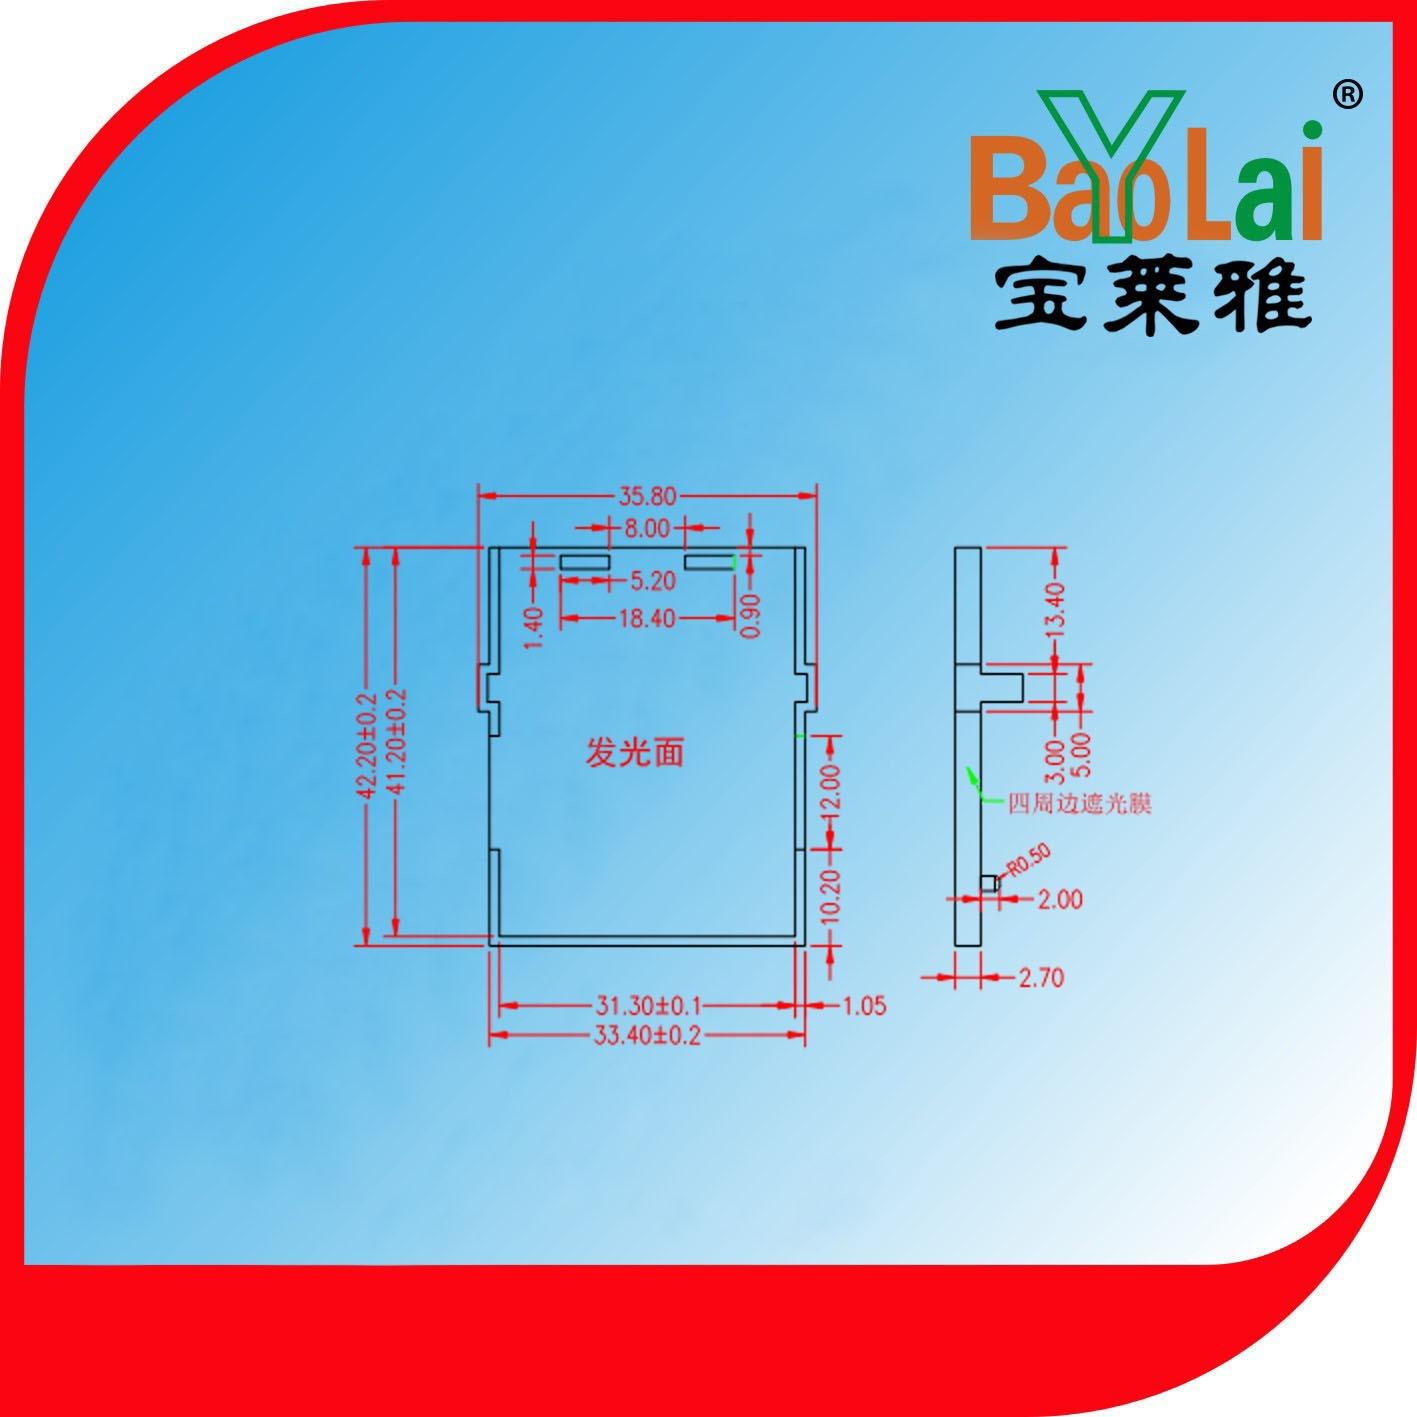 LED背光源模组开模定制 仪器仪表家电背光源导光板发光板亚克力